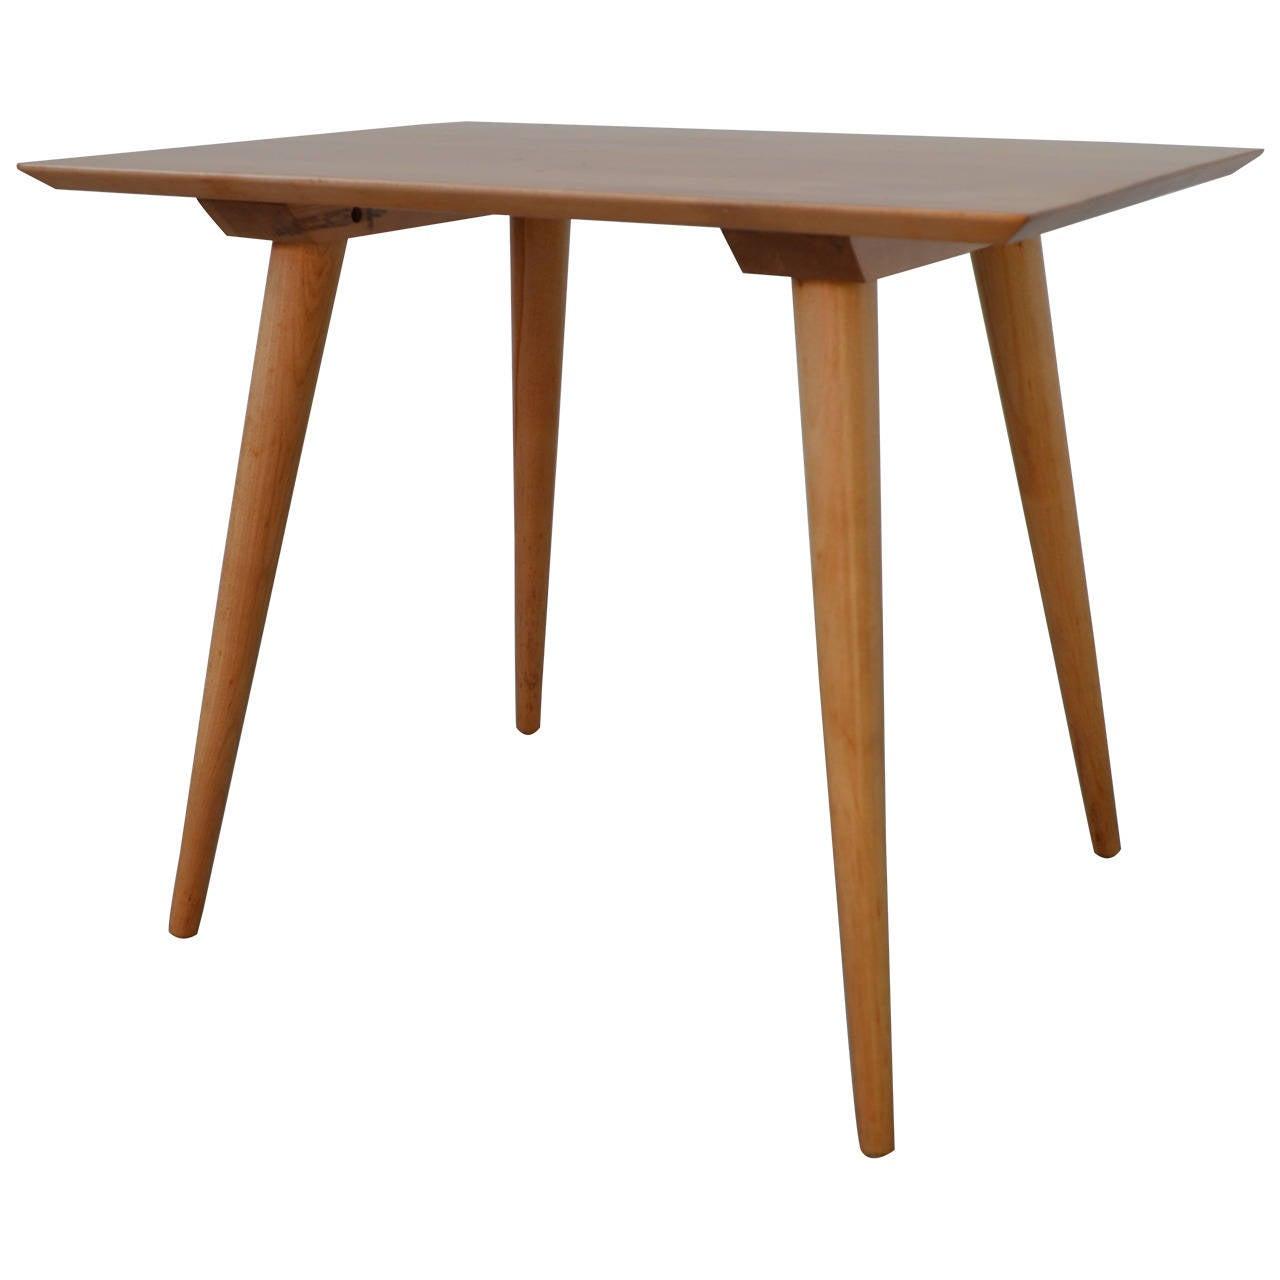 End Table by Paul McCobb